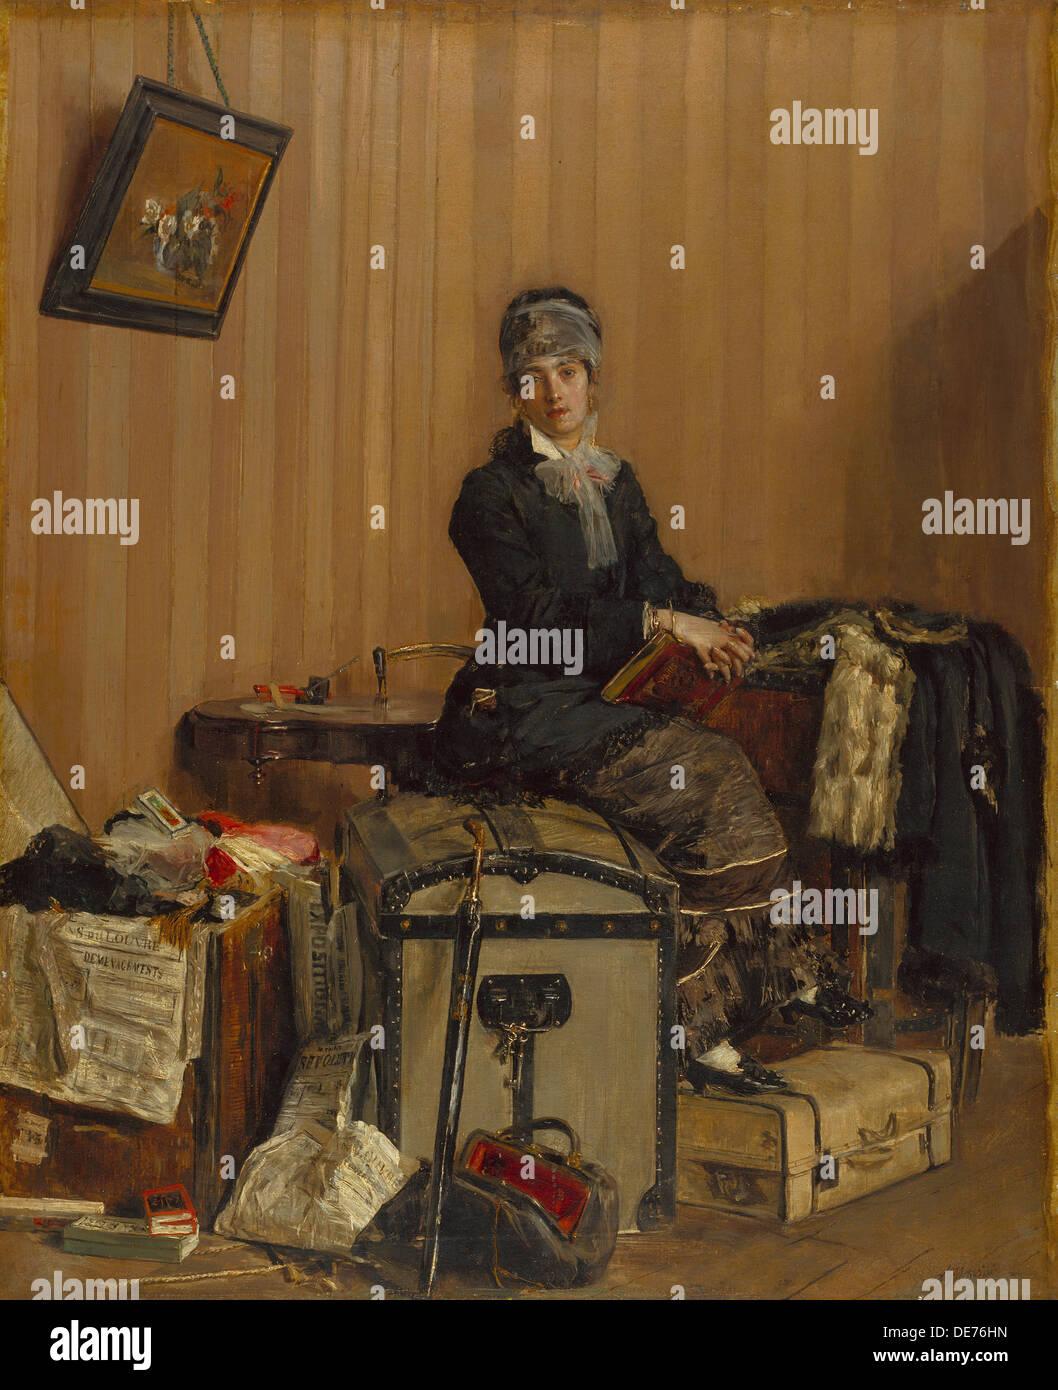 The Customs, 1877. Artist: Mancini, Antonio (1852-1930) - Stock Image